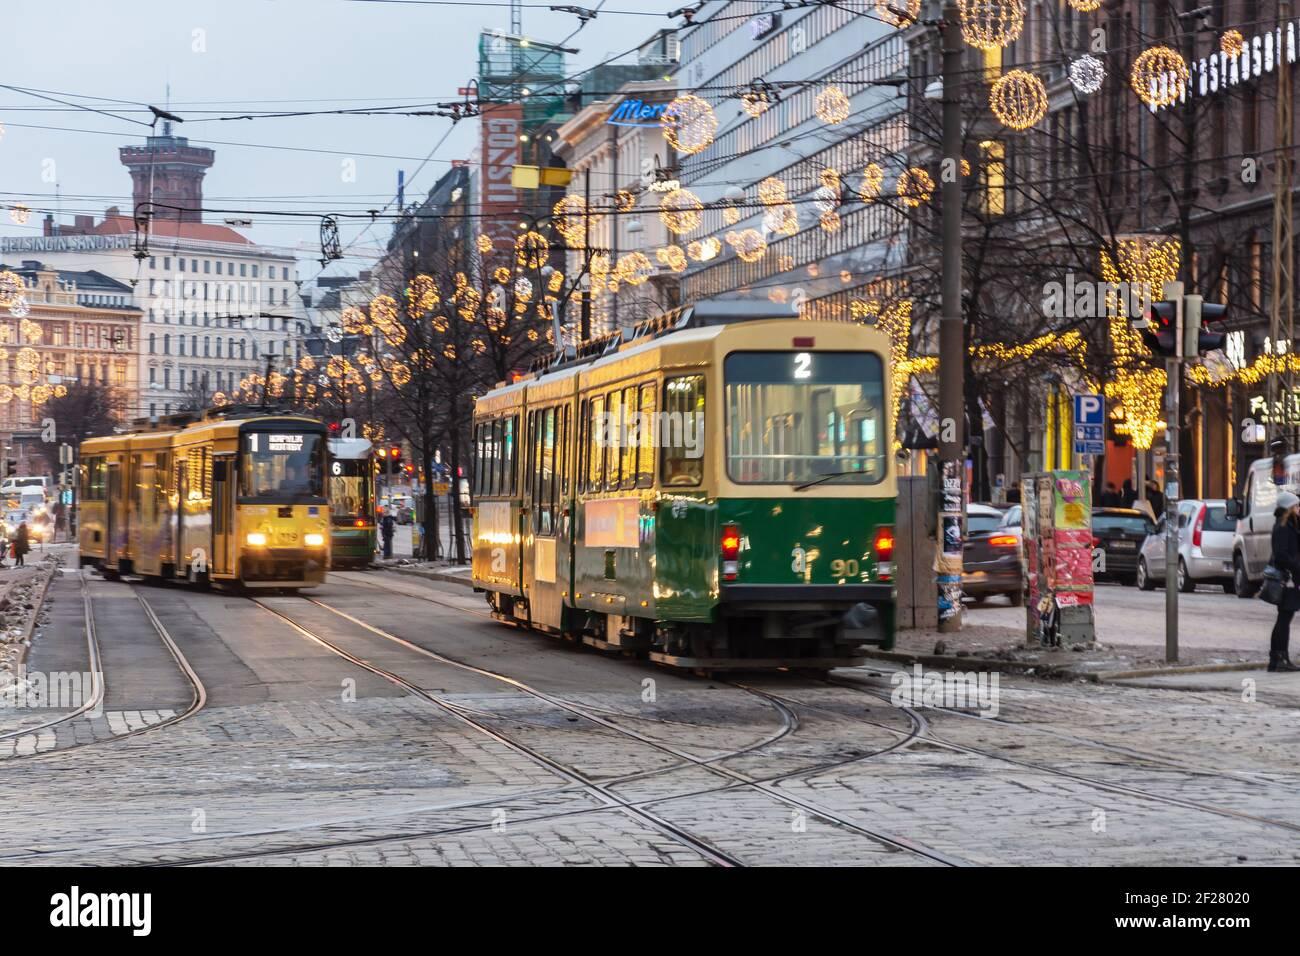 Trams at Mannerheimintie street in the evening in Helsinki Finland Stock Photo